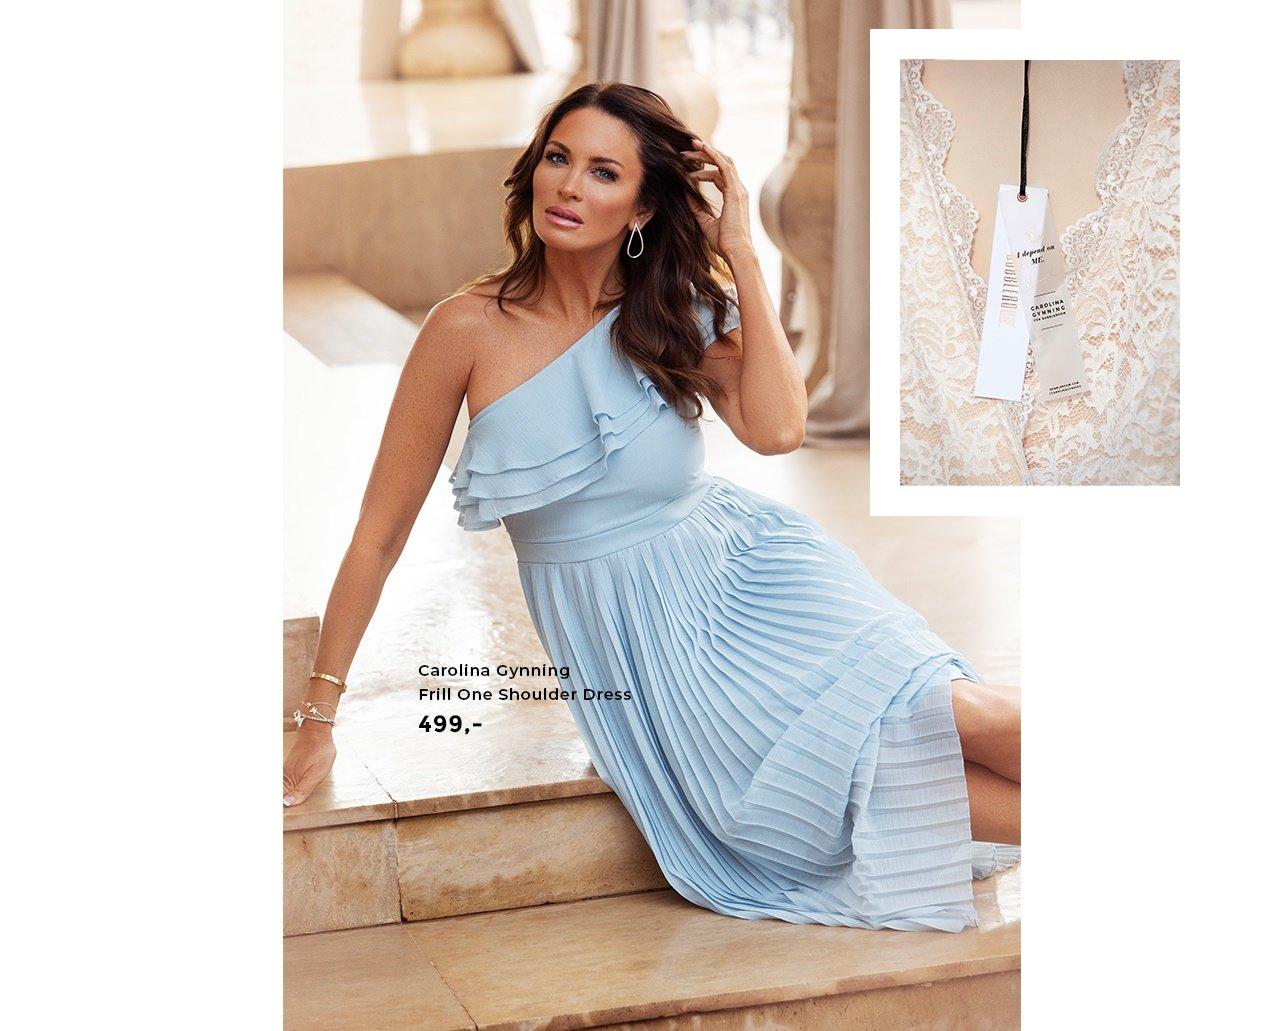 a6abf1c7e9f3 Carolina Gynning Frill One Shoulder Dress